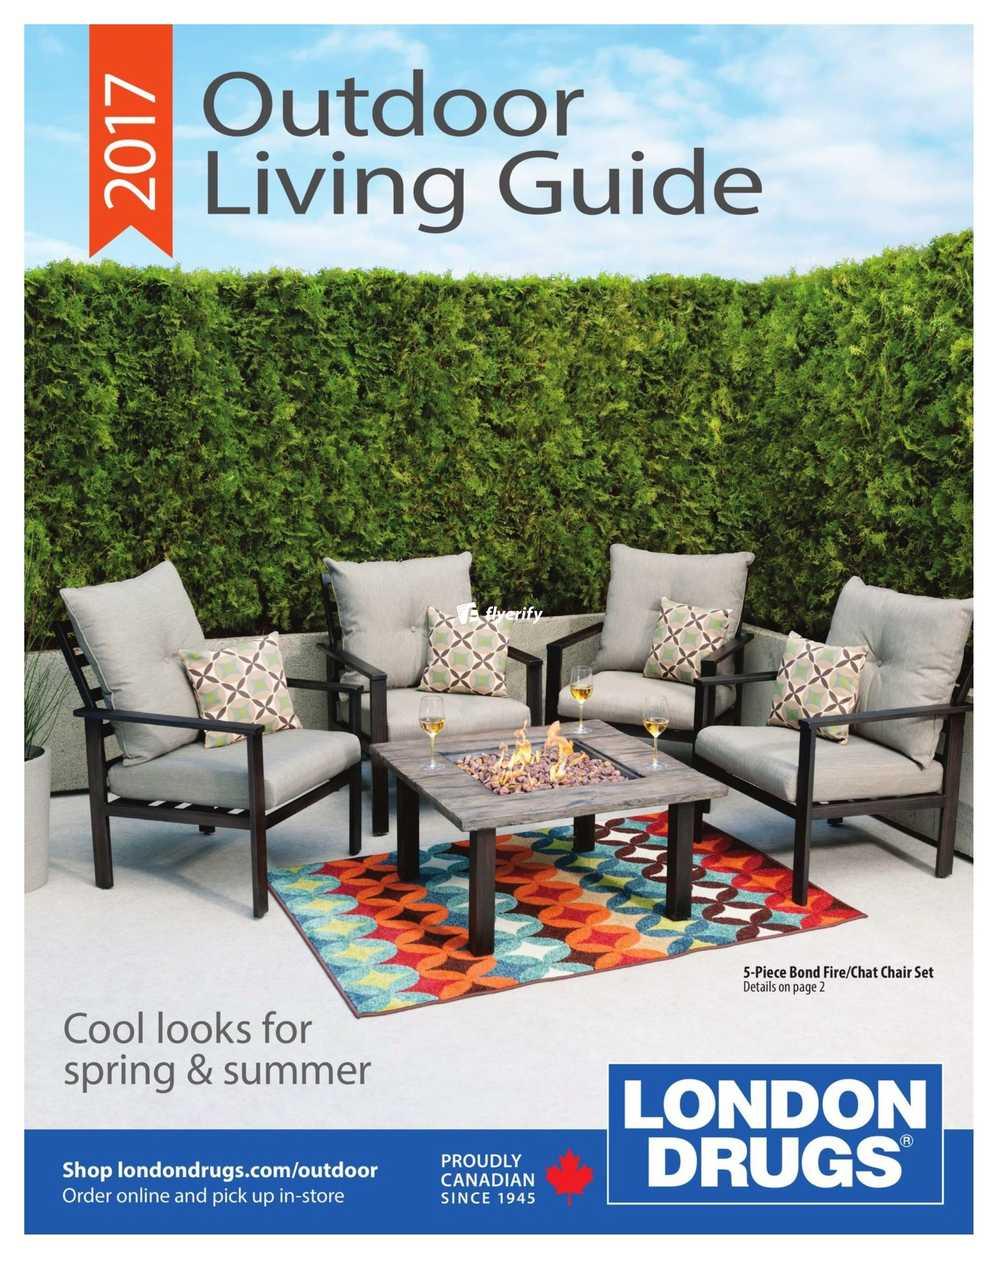 London Drugs Patio Furniture - London Drugs Patio Furniture Outdoor Goods